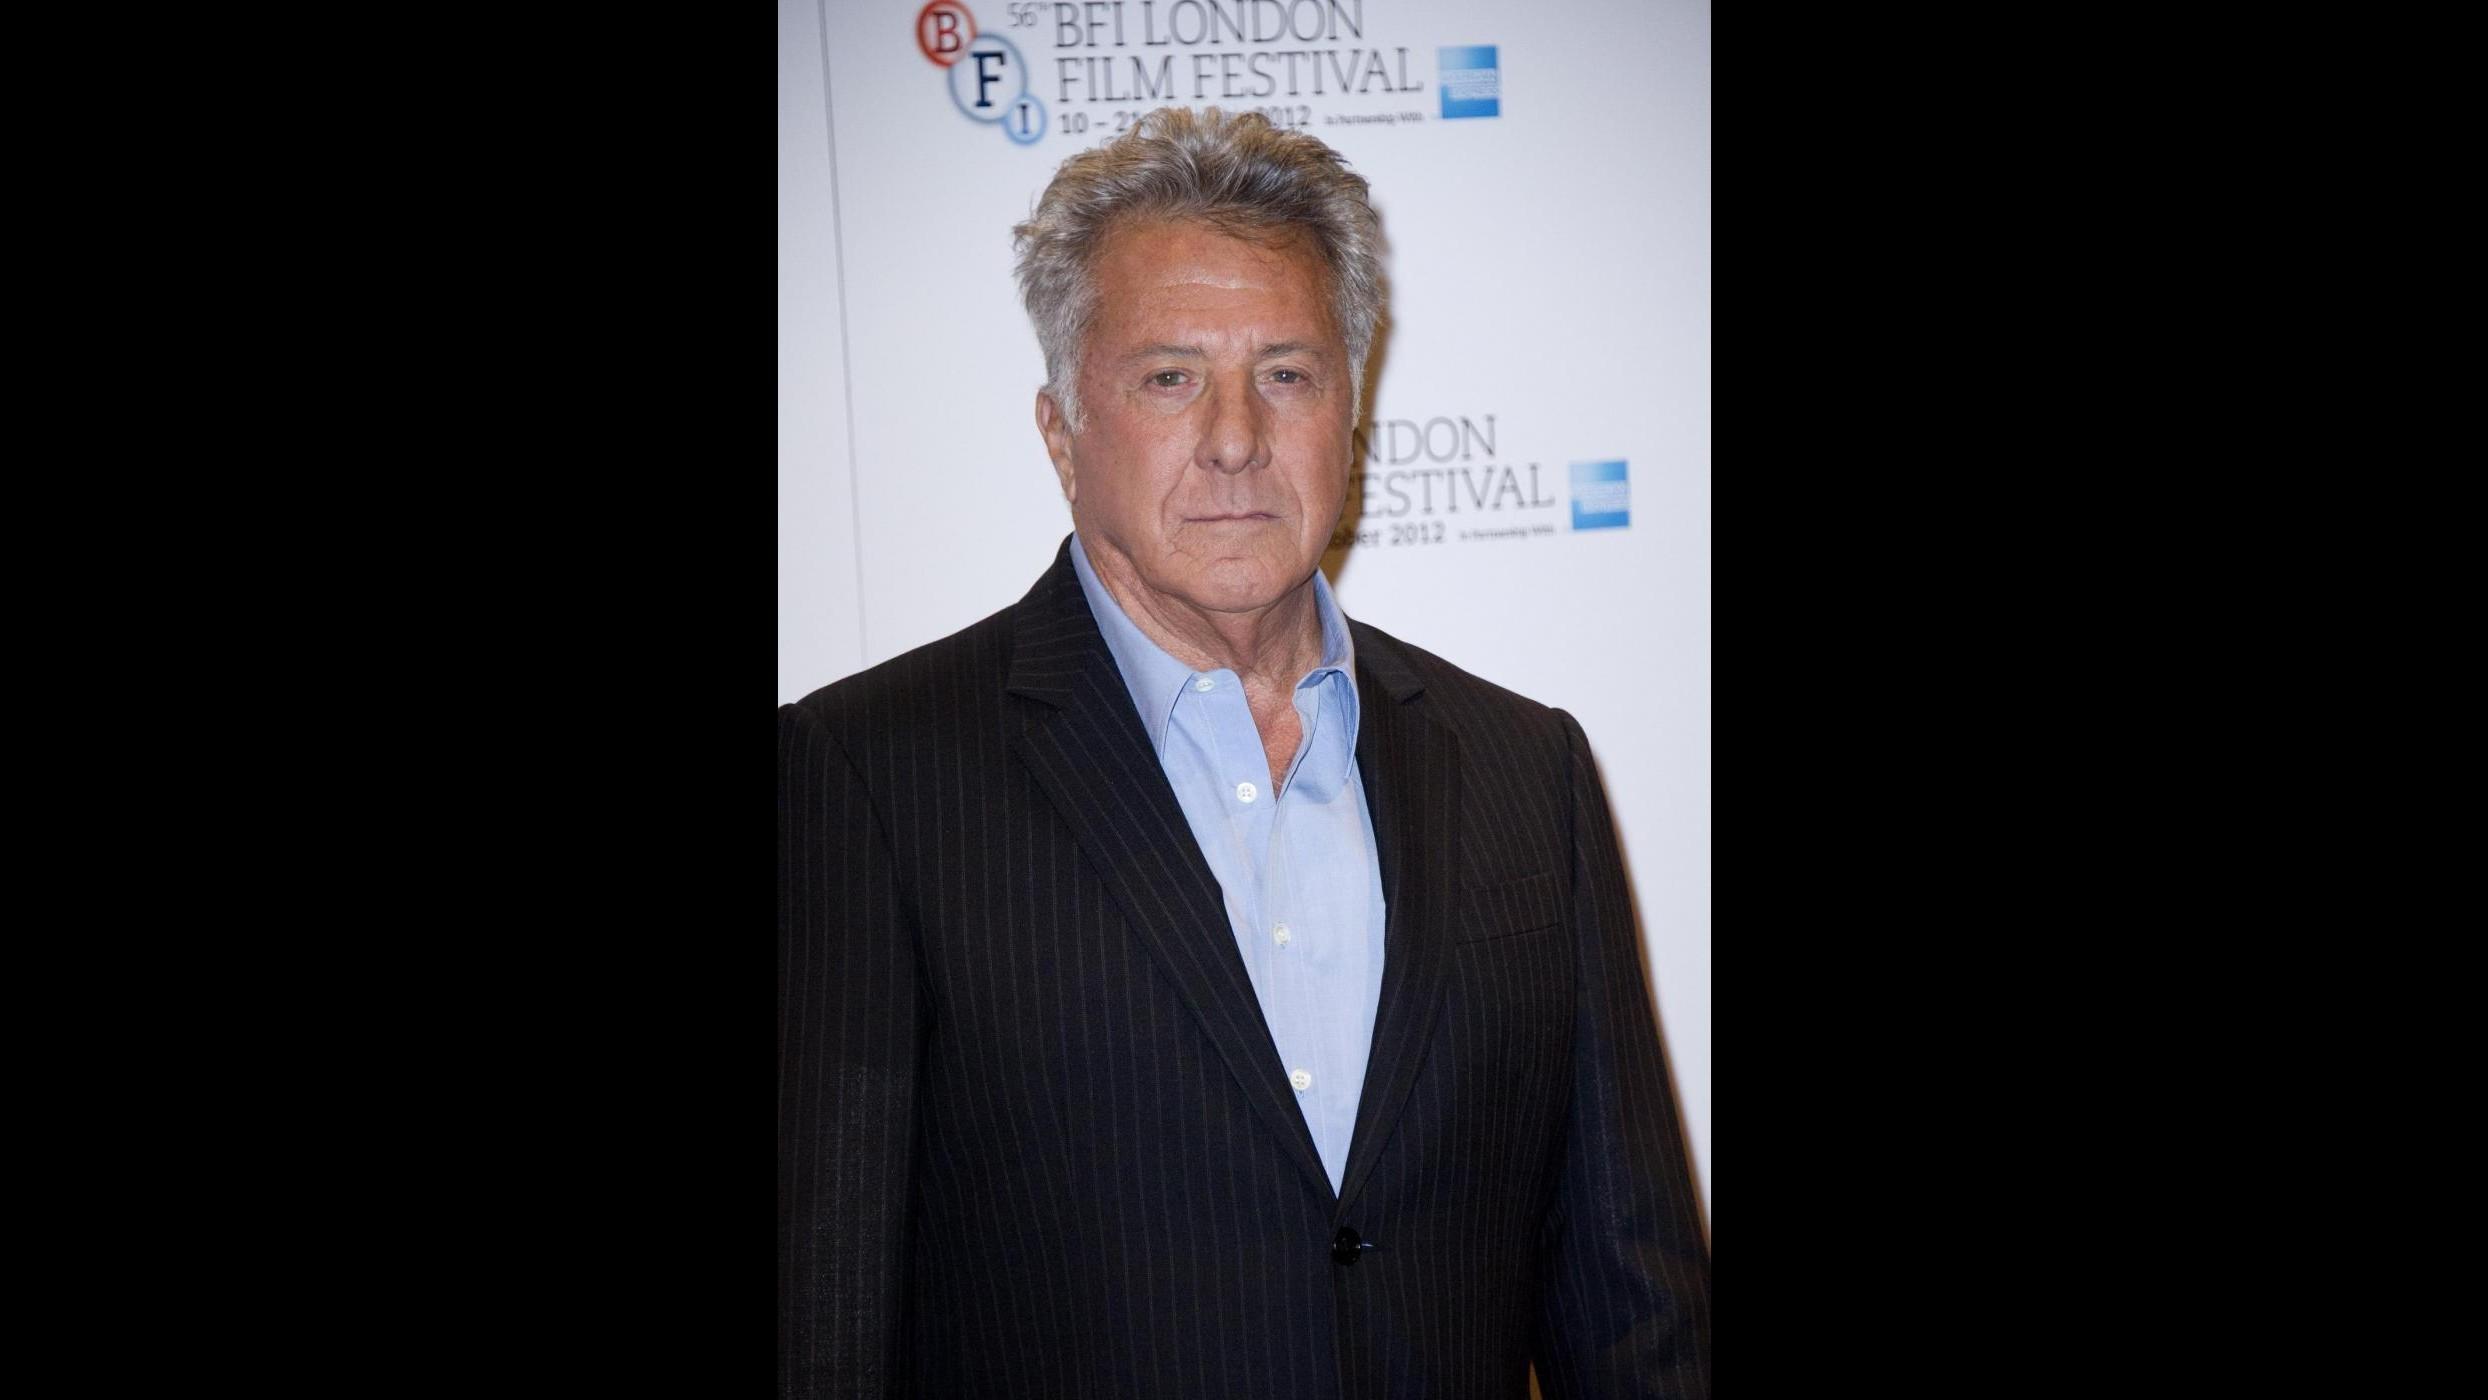 TFF, 'Quartet' di Dustin Hoffman apre Torino Film Festival 23 novembre